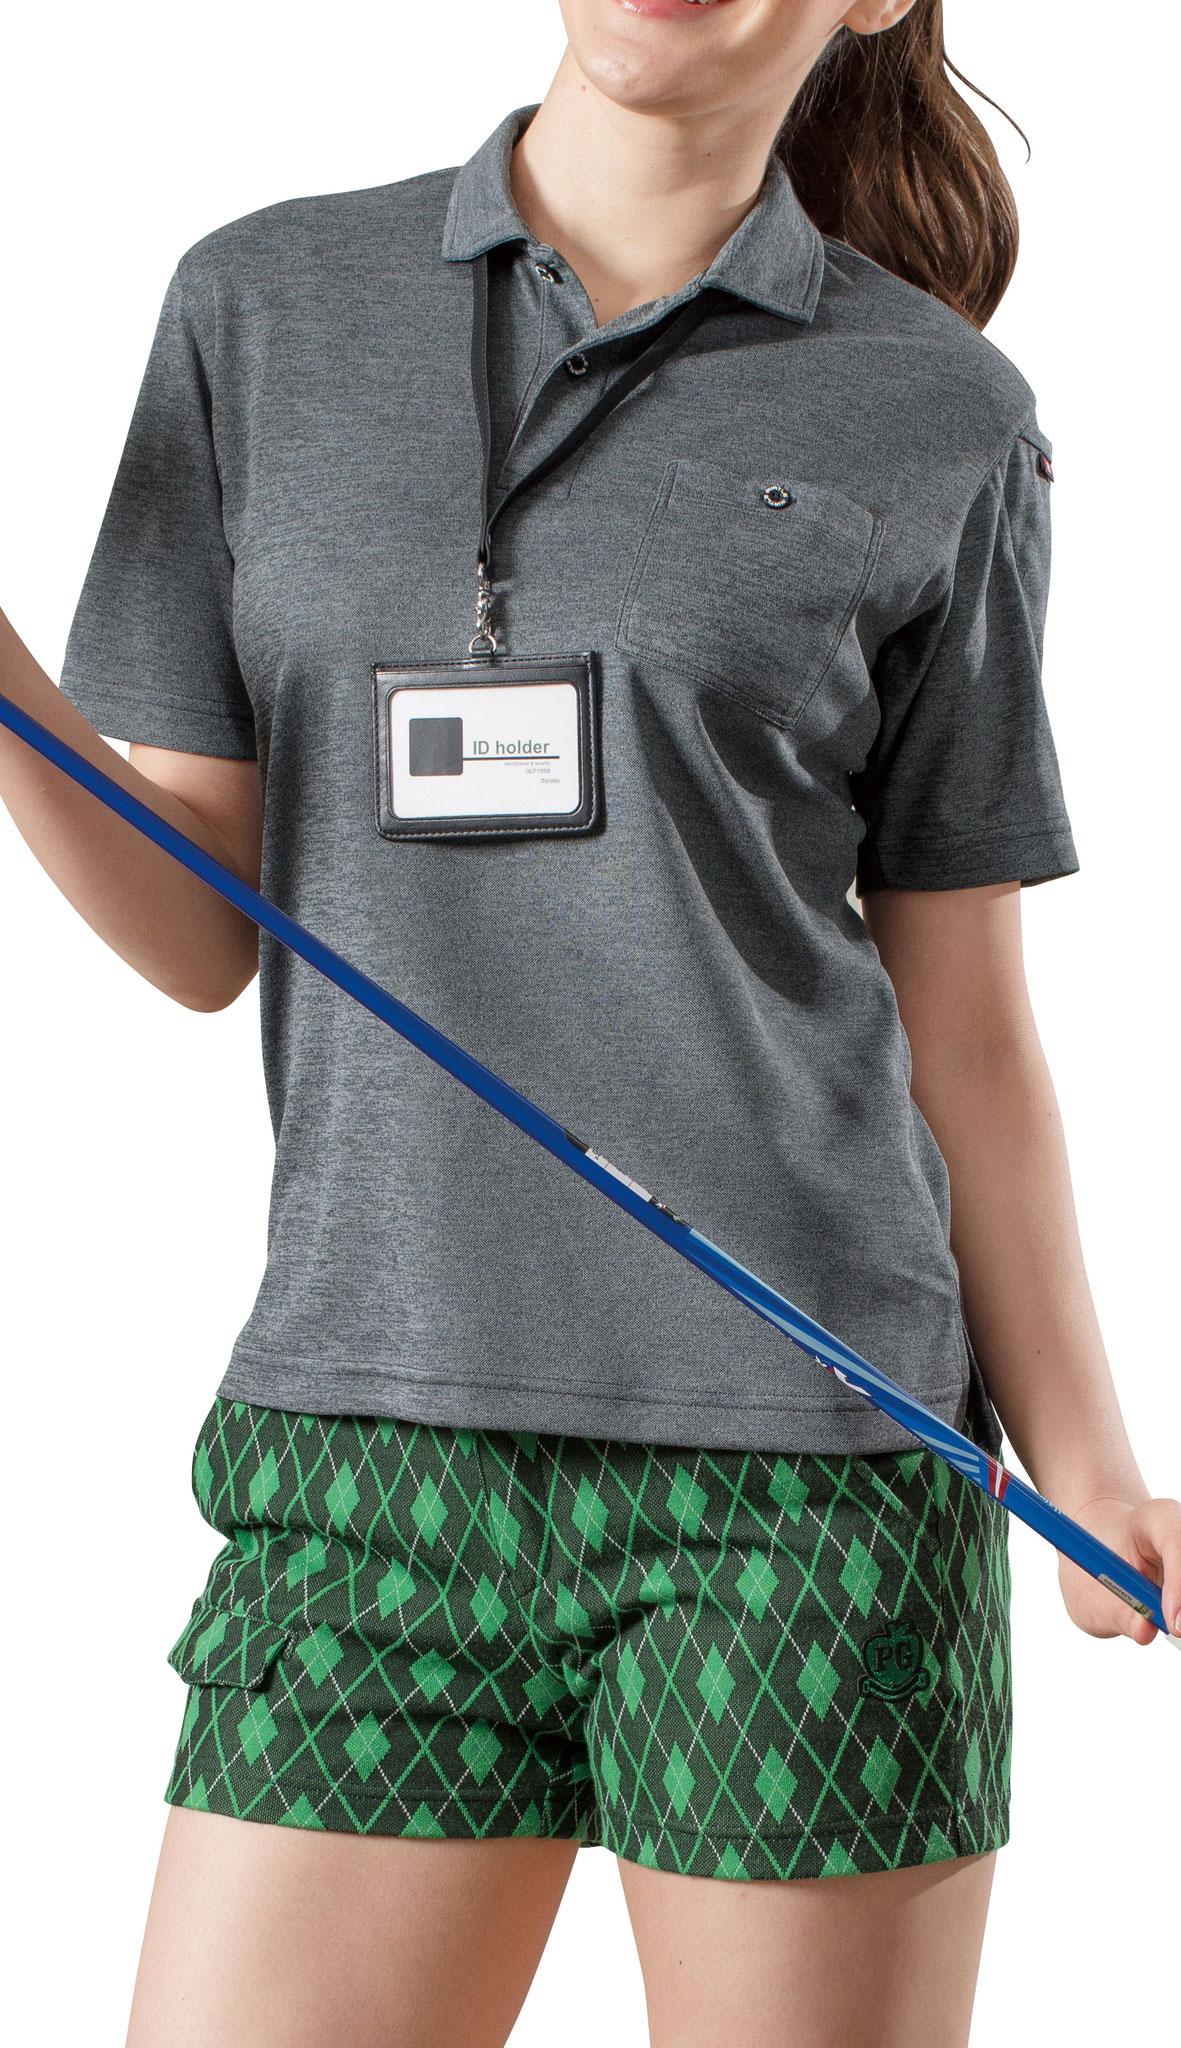 BURTLE~バートル~667 半袖ポロシャツ ¥1,290(税込)